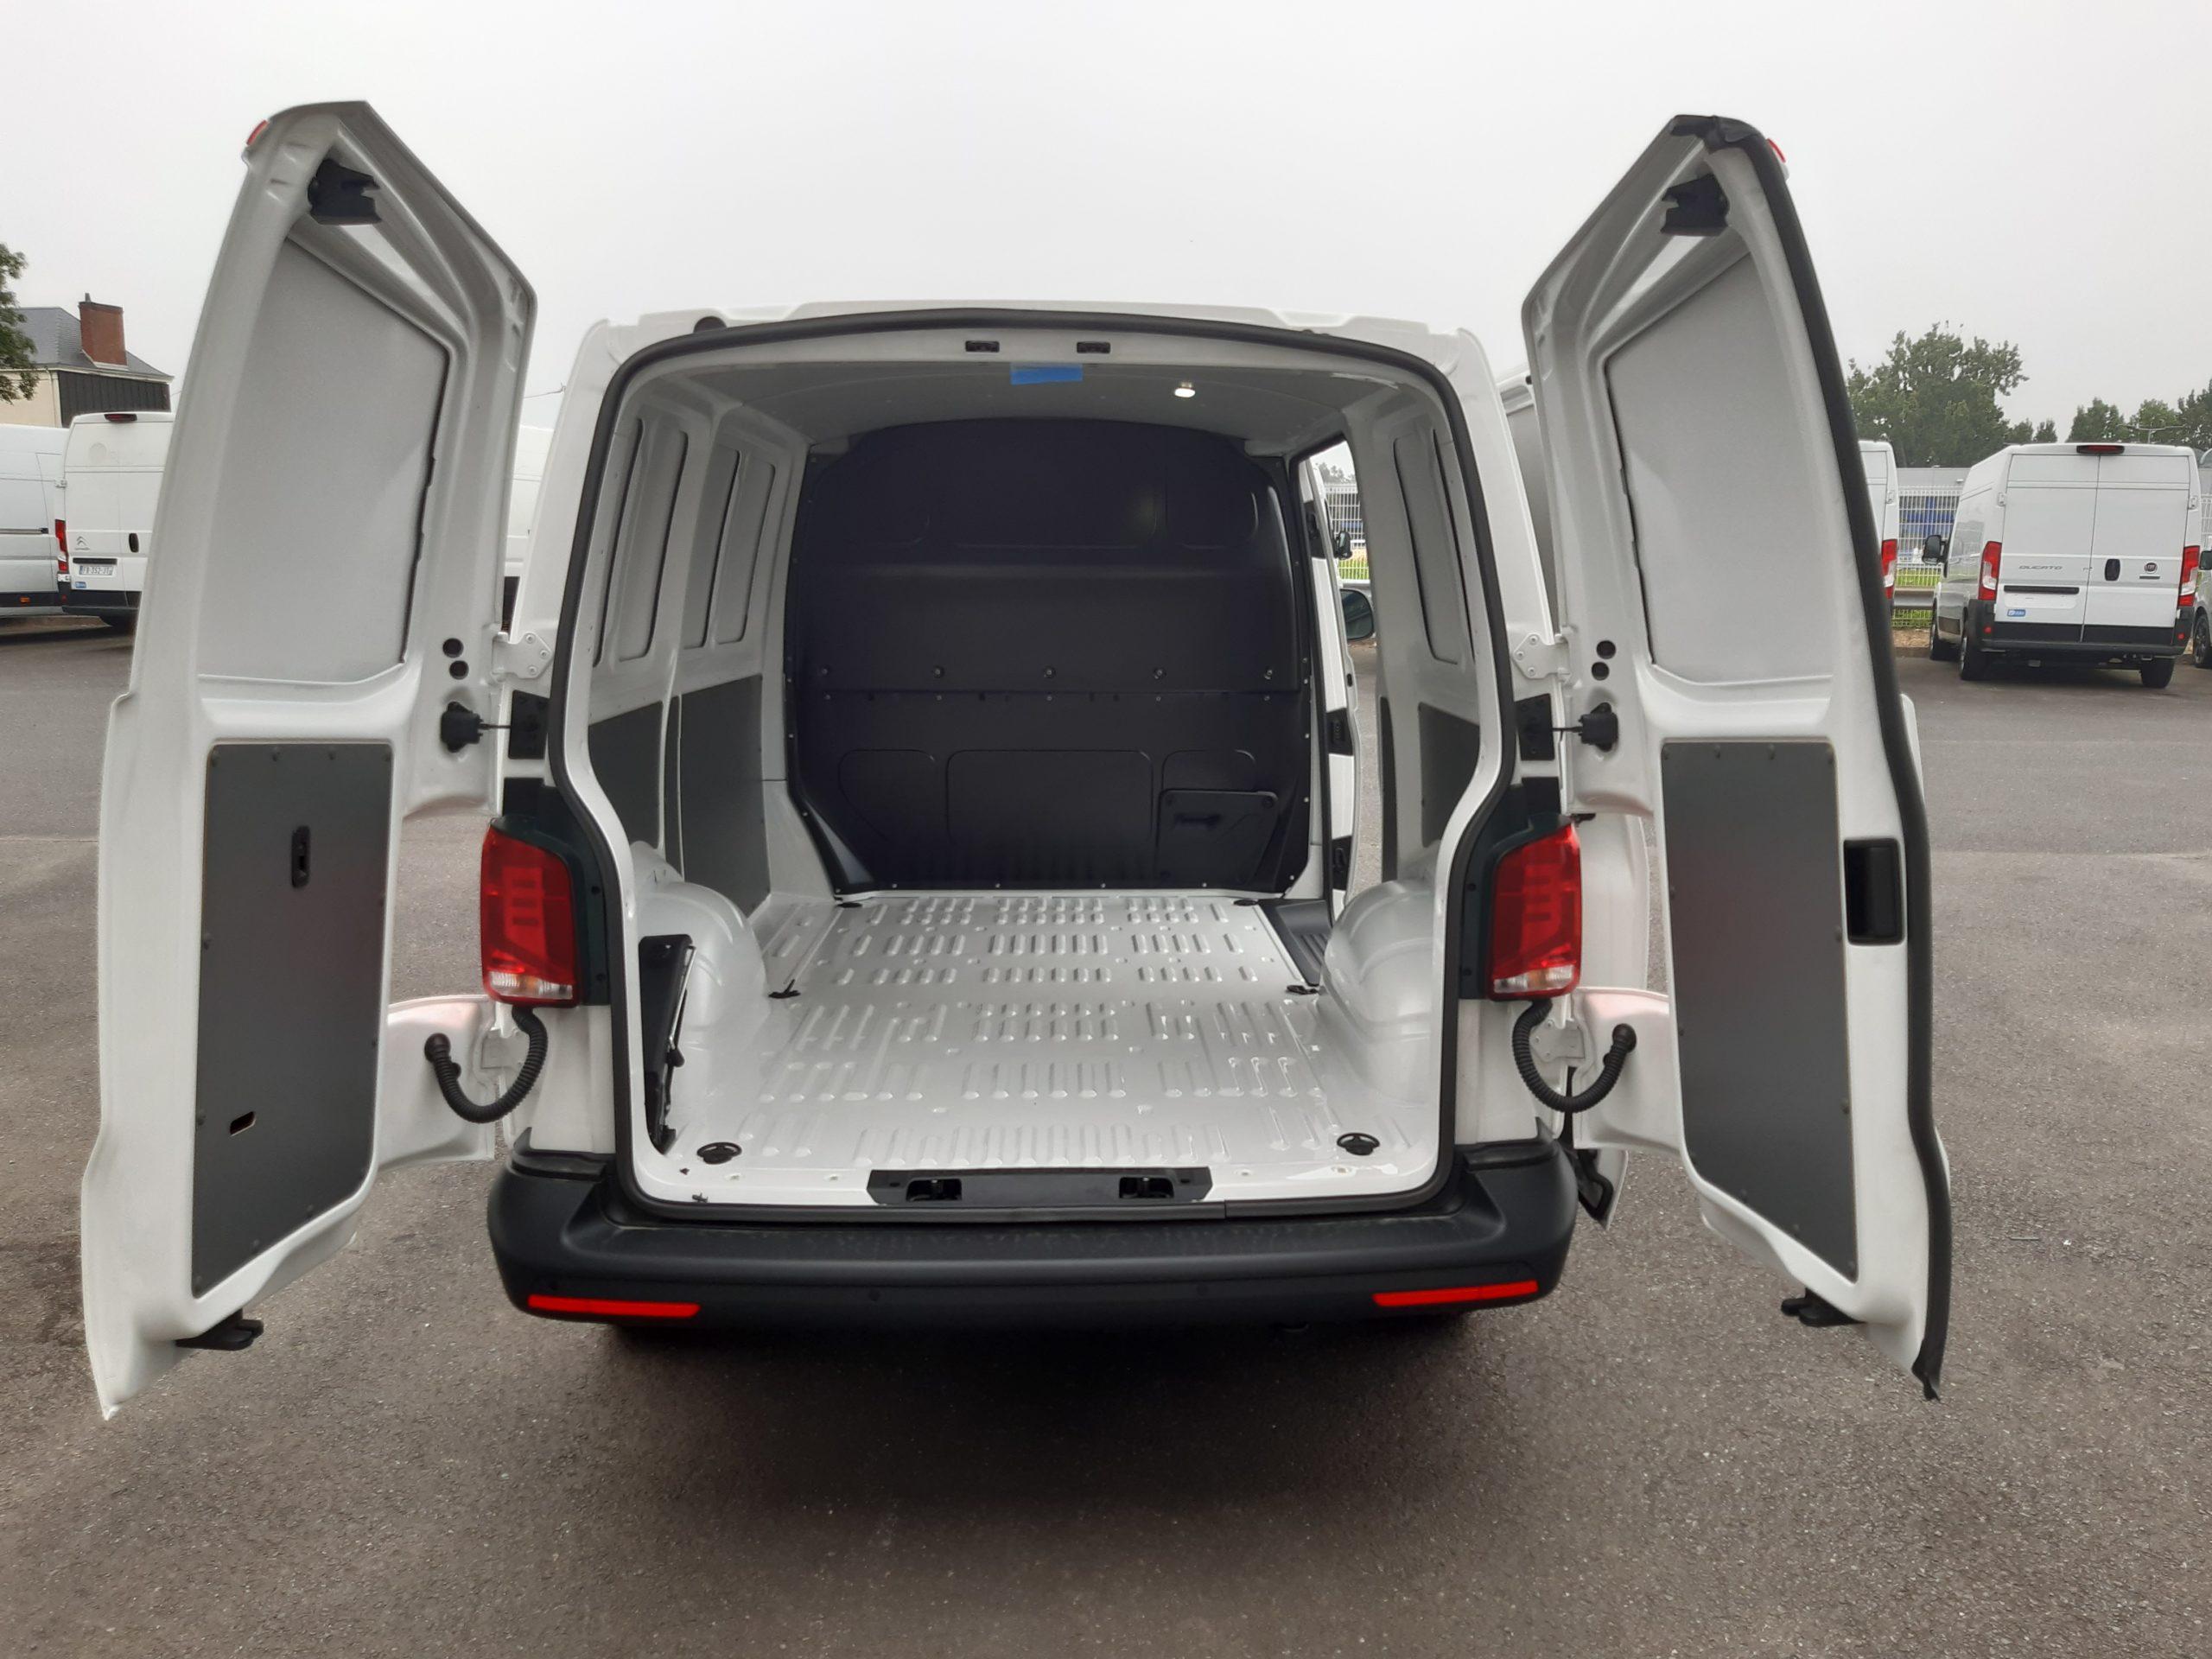 Location d'un fourgon compact double cabine - Volkswagen Transporter T6-1 - Vue6